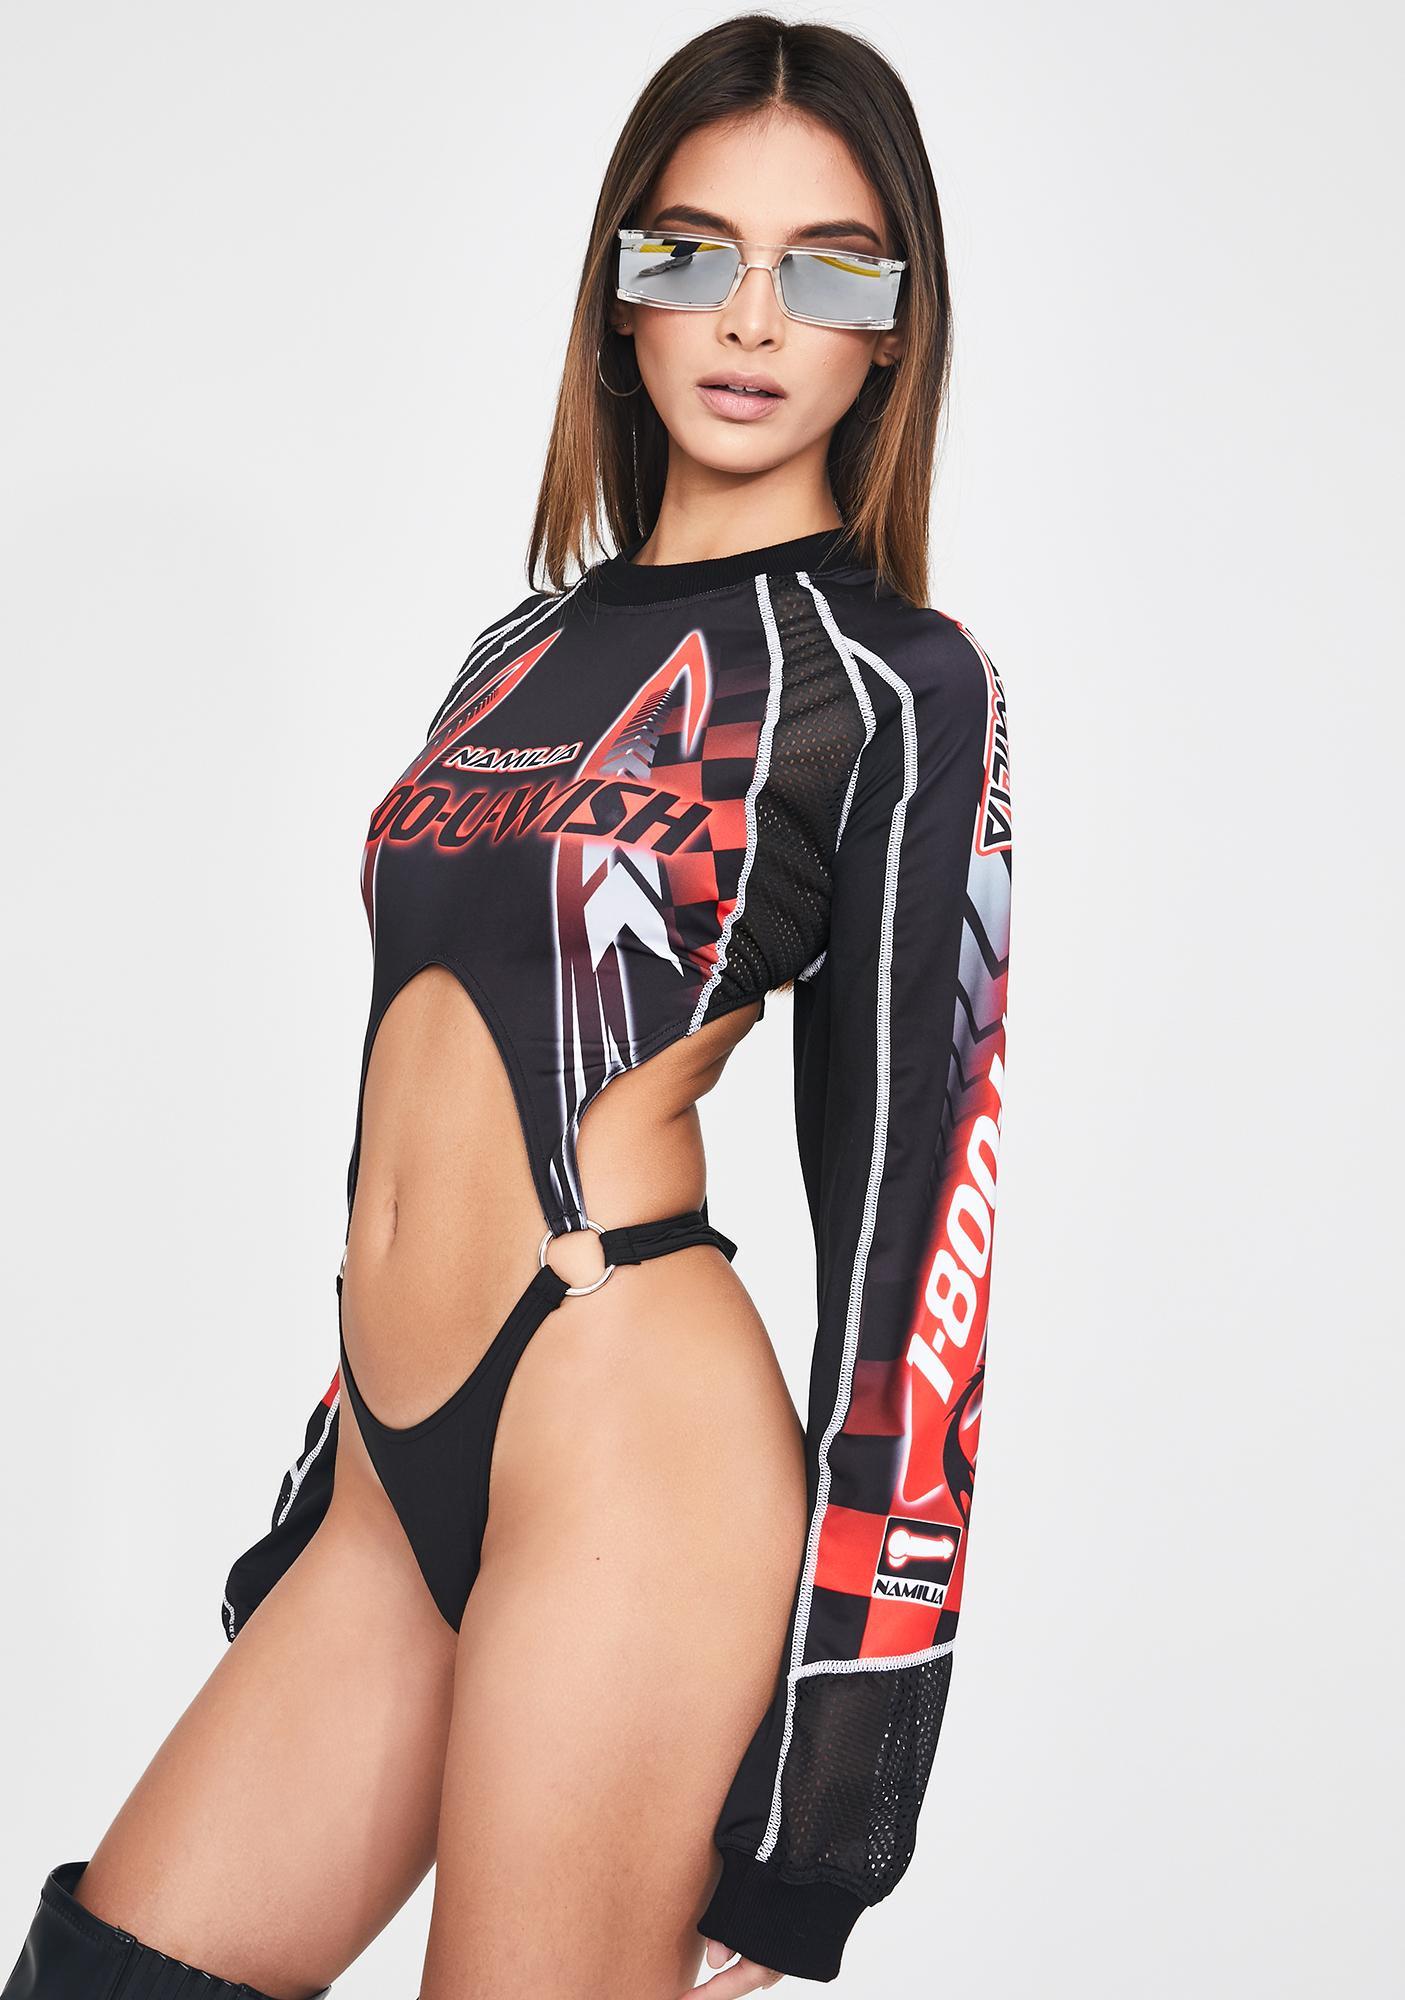 Namilia 1-800-U-Wish Red Racing Bodysuit